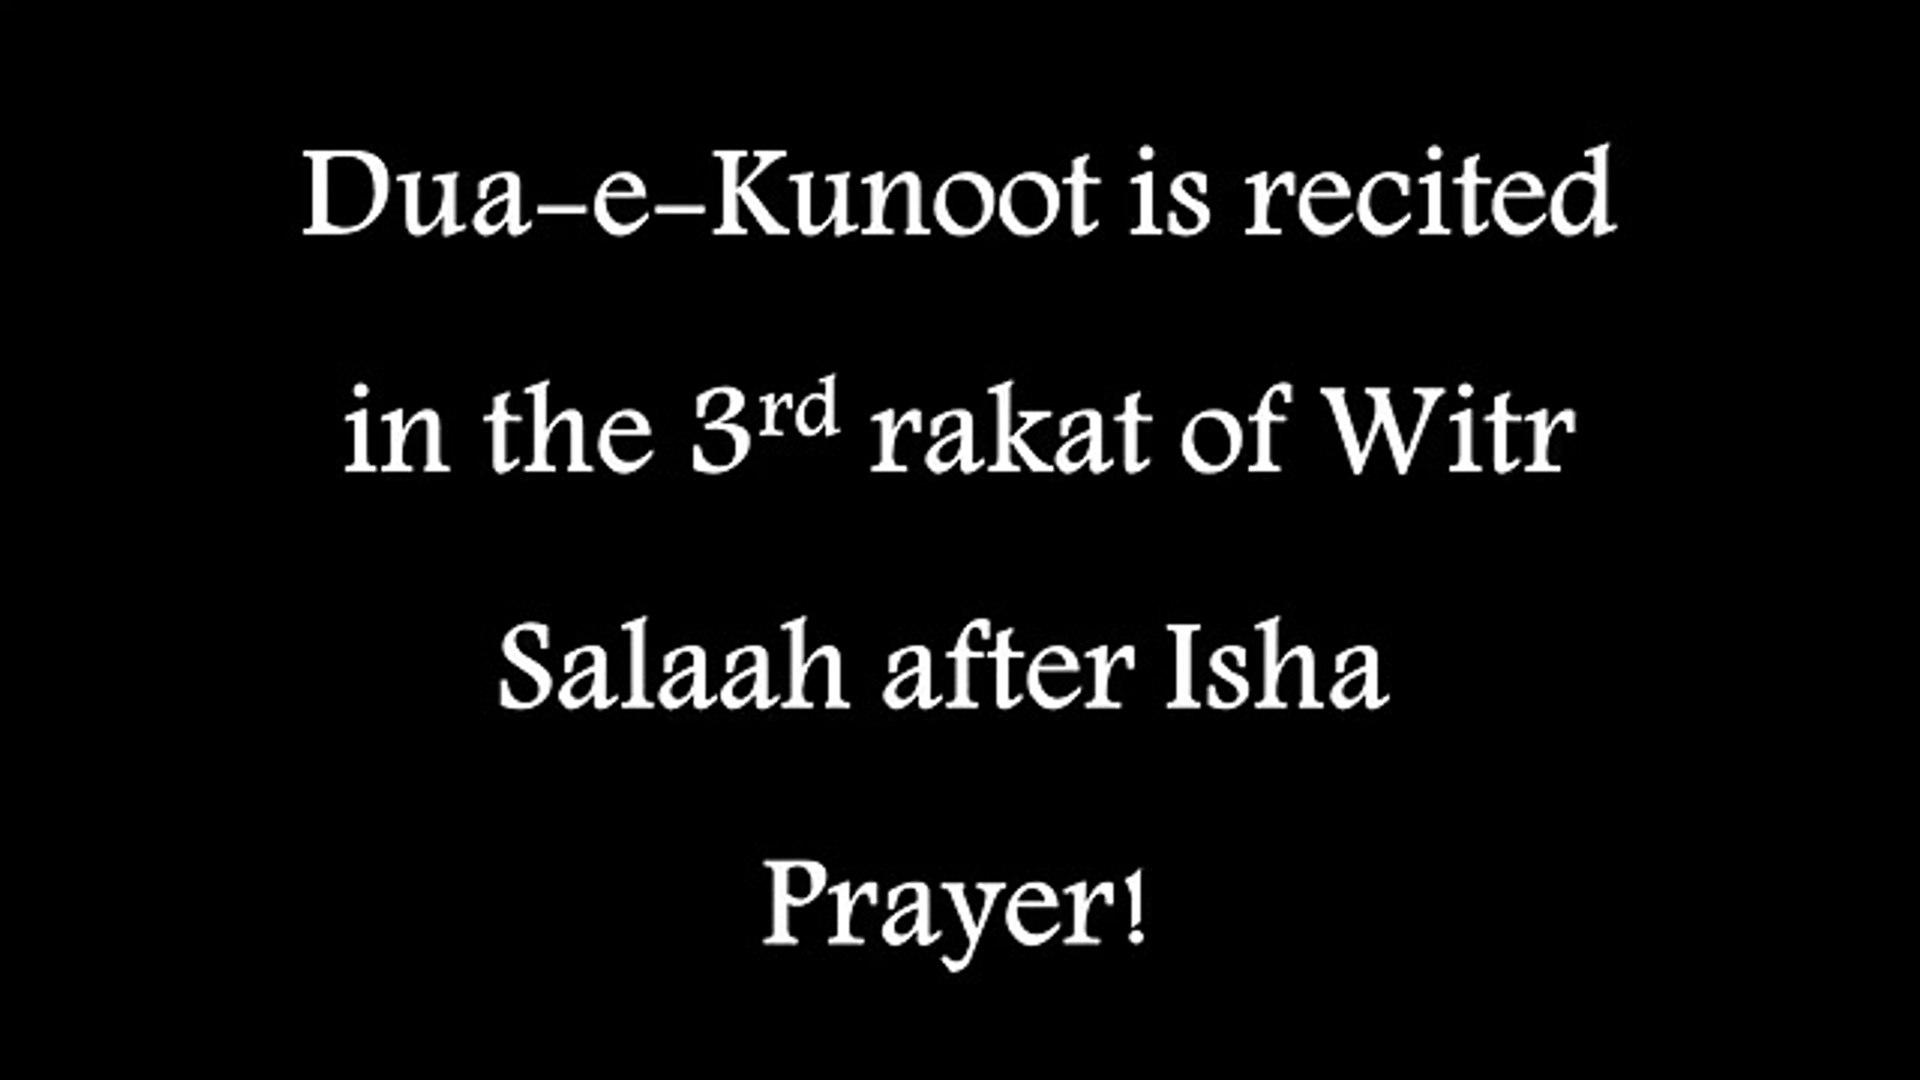 Dua e Qunoot - Witr (Hanafi) - Recitation - English Translation,  Transliteration [HQ] -